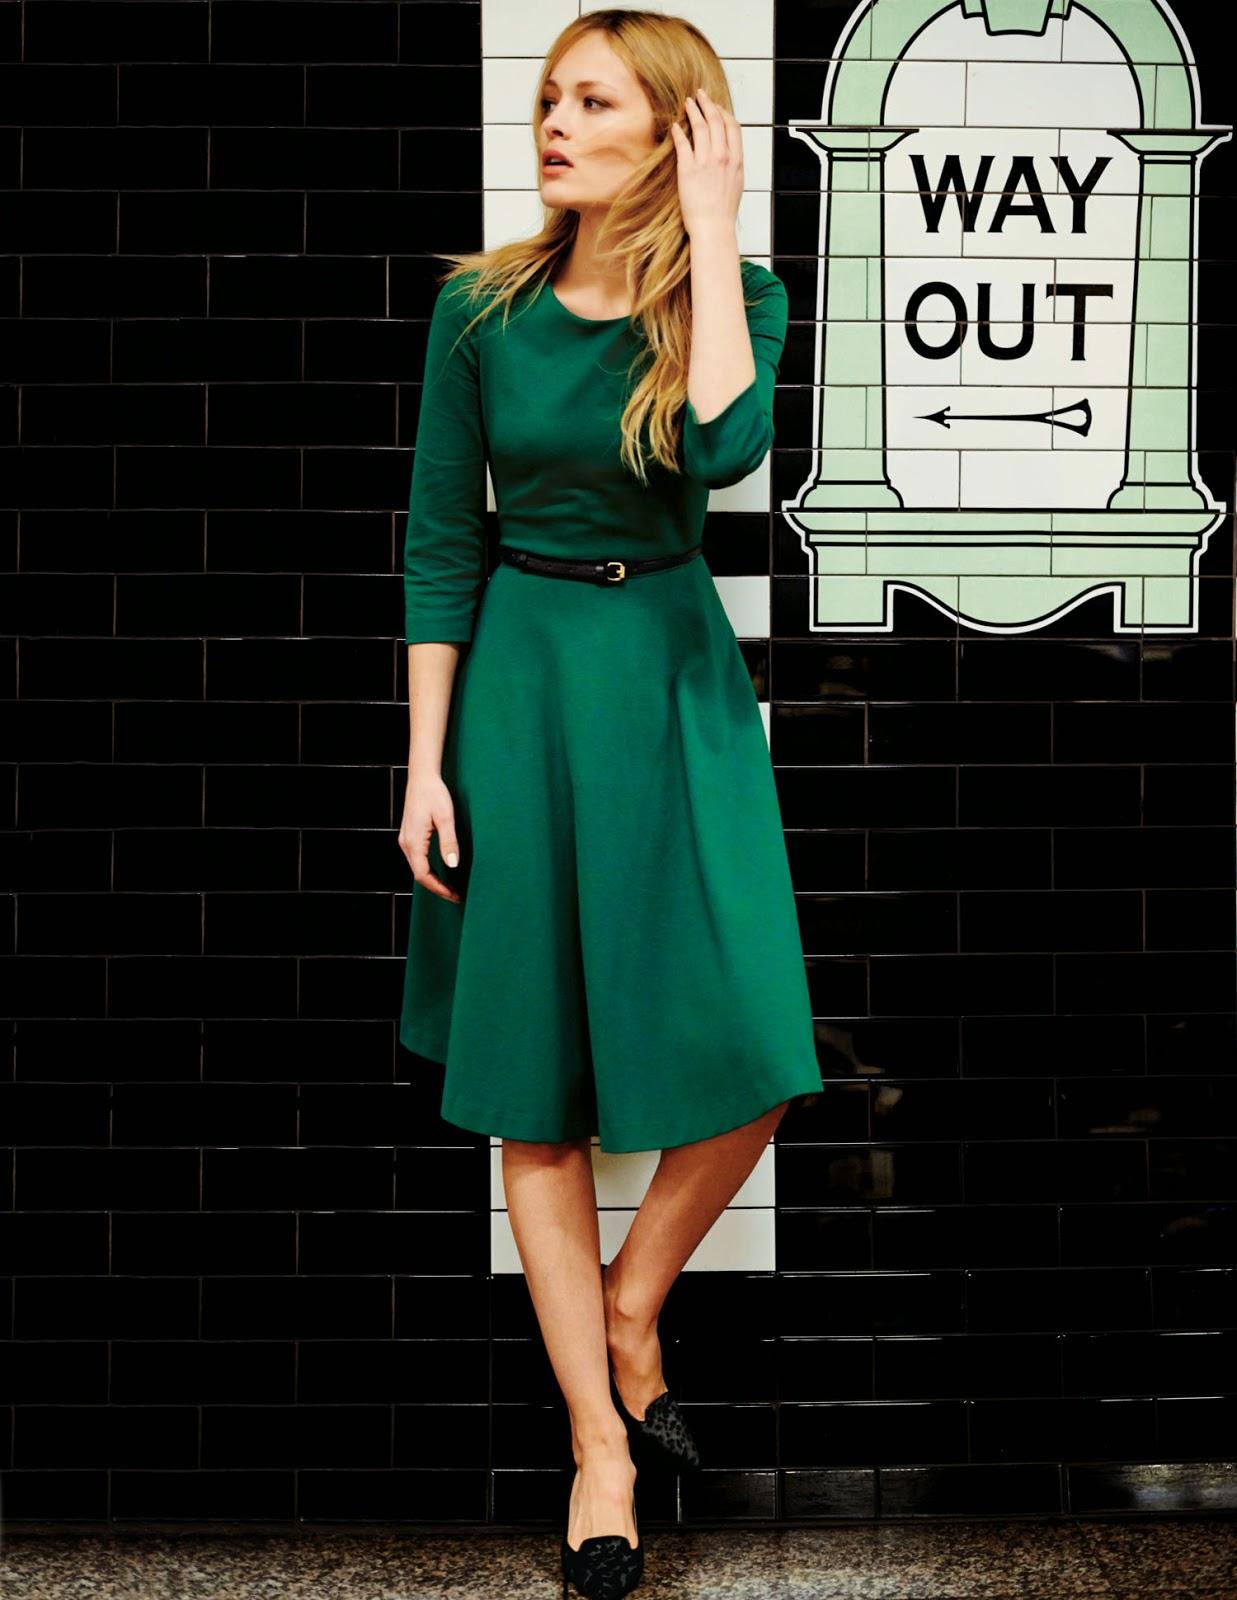 Modest bold midi dress with sleeves | Follow Mode-sty for stylish modest clothing tznius orthodox jewish muslim hijab mormon lds pentecostal islamic evangelical christian